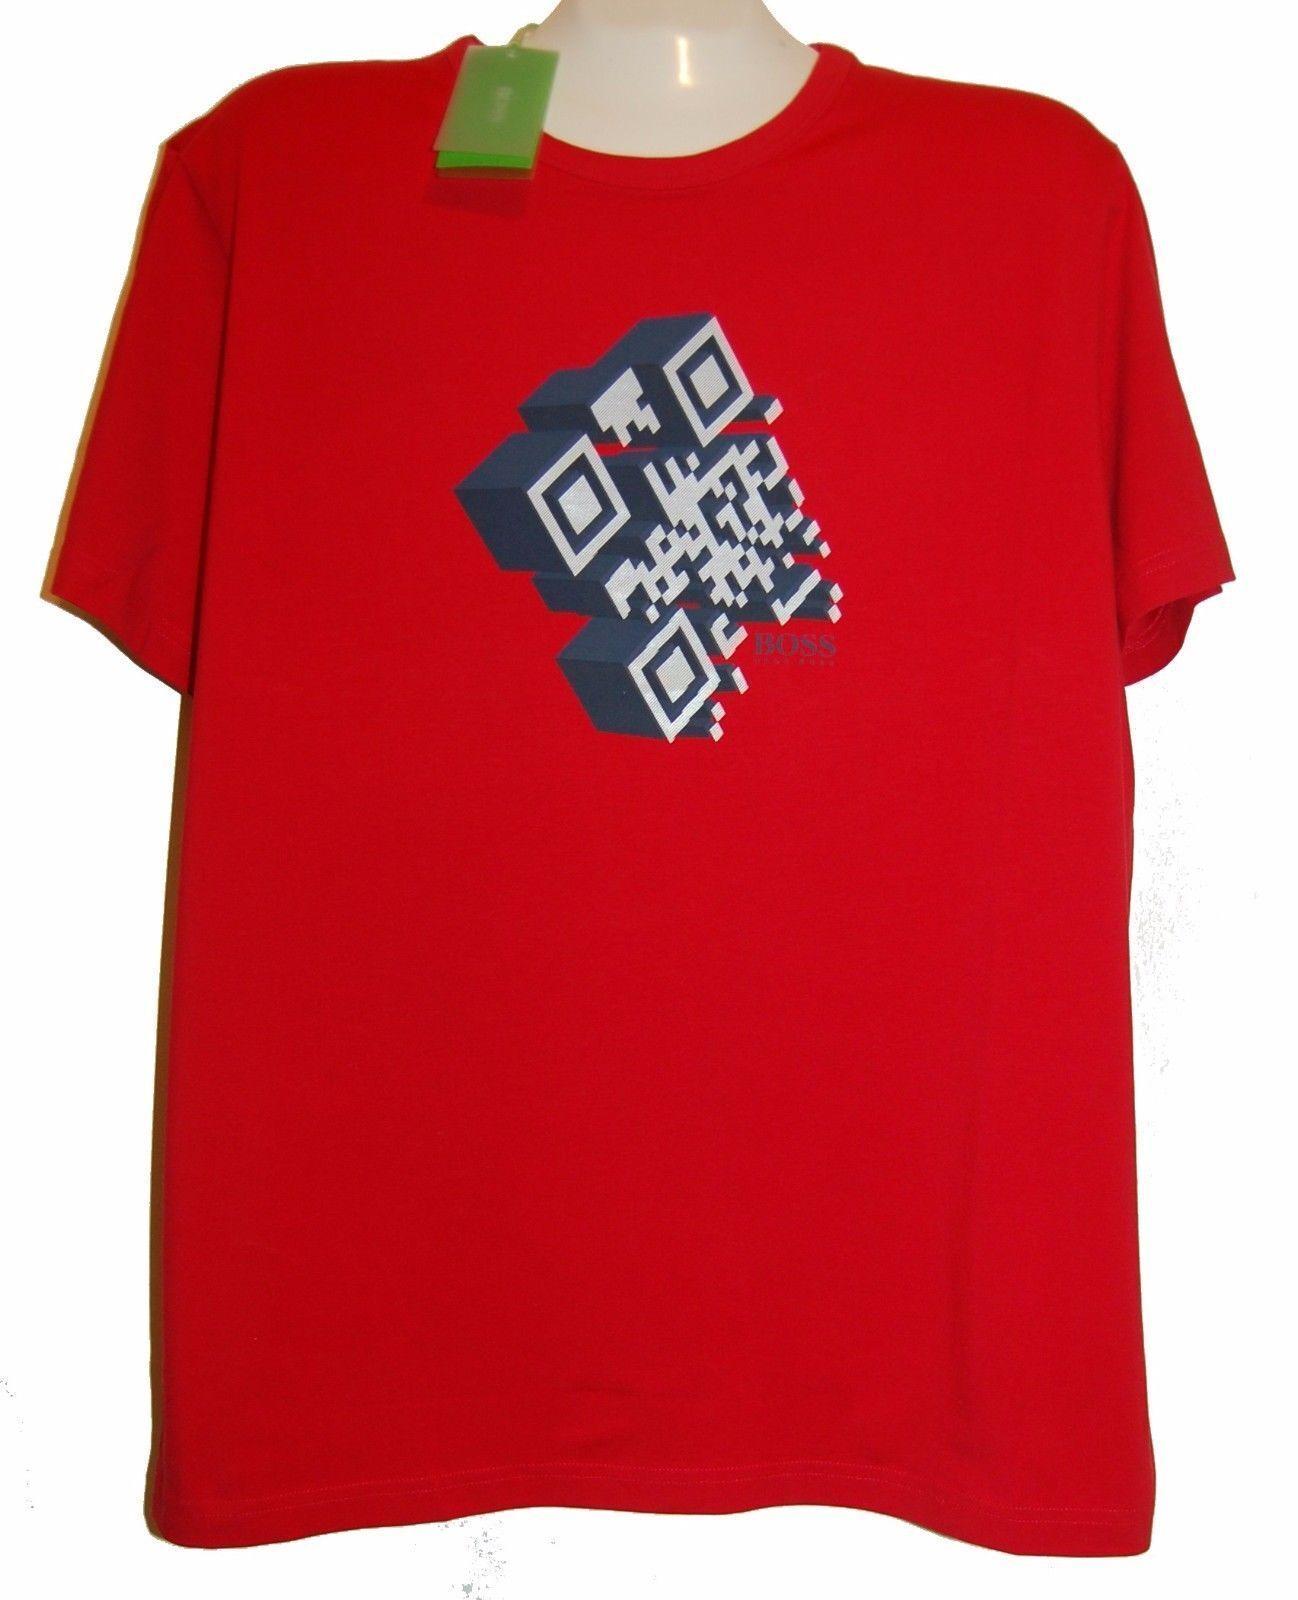 Hugo Boss Red Graphic Logo Design Cotton Men's T- Shirt Sz 2XL NEW Green Label